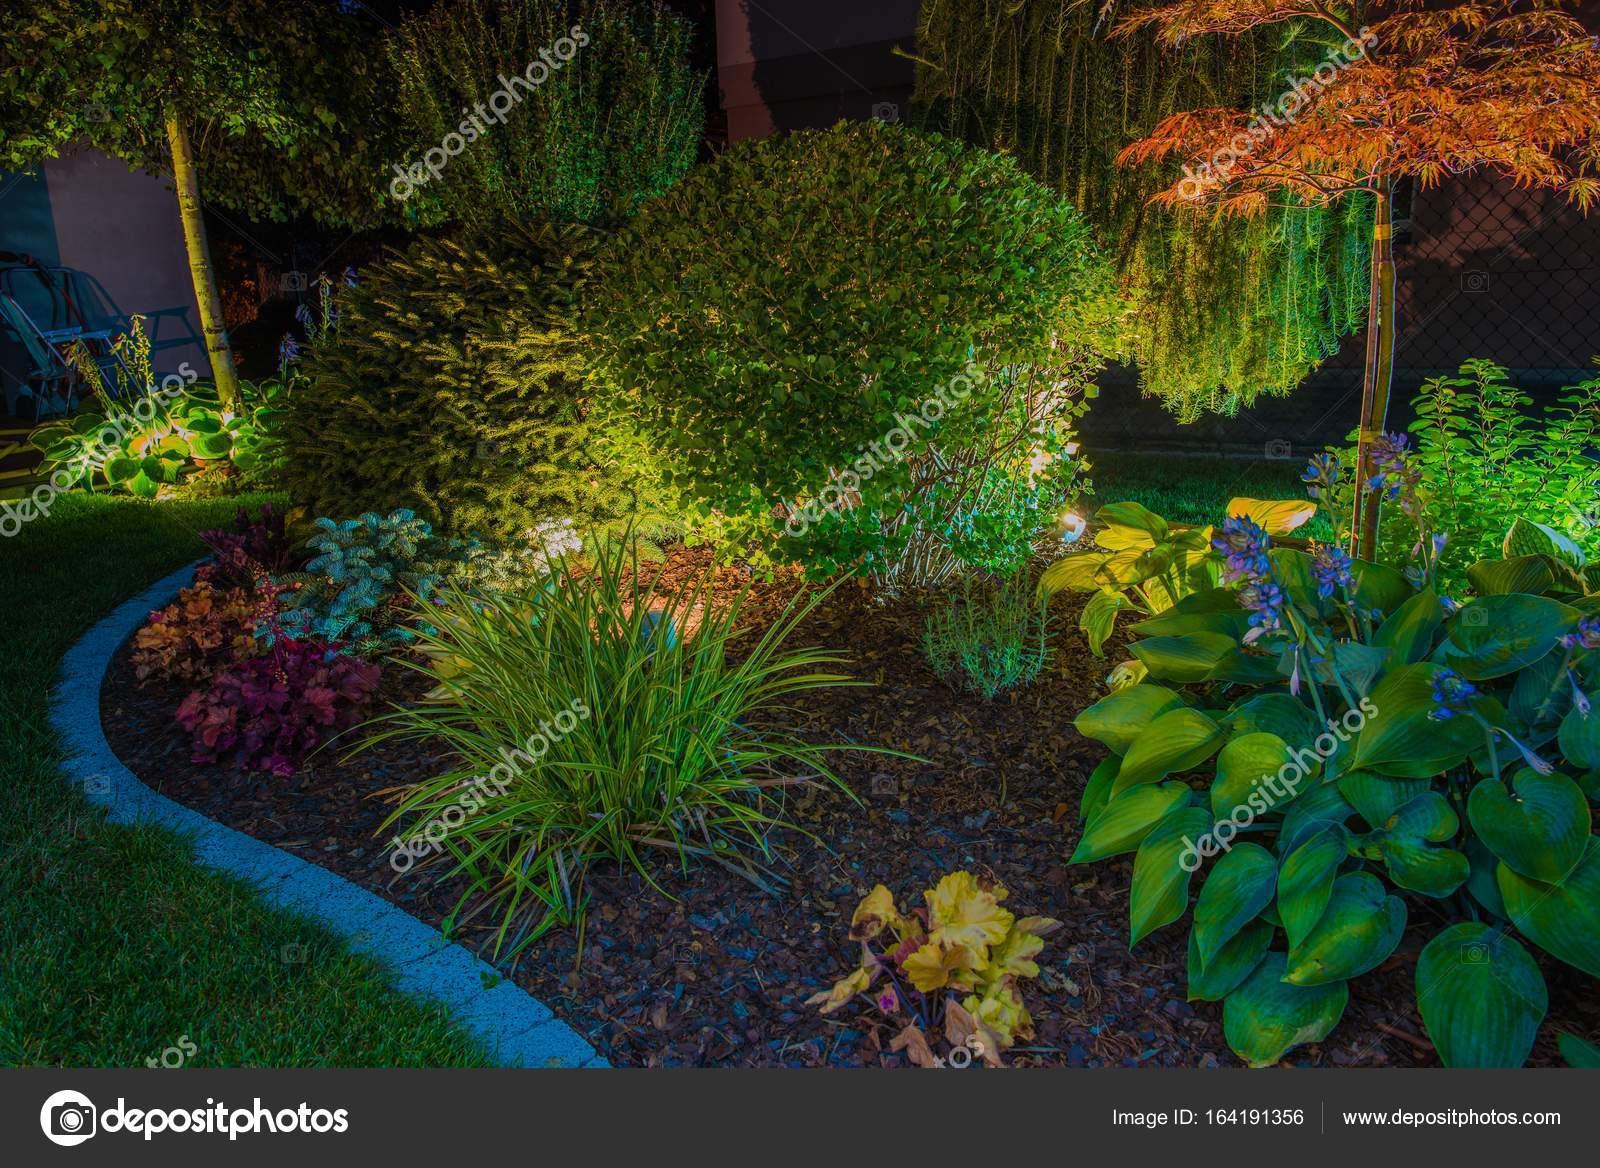 Elegante tuin verlichting — Stockfoto © welcomia #164191356